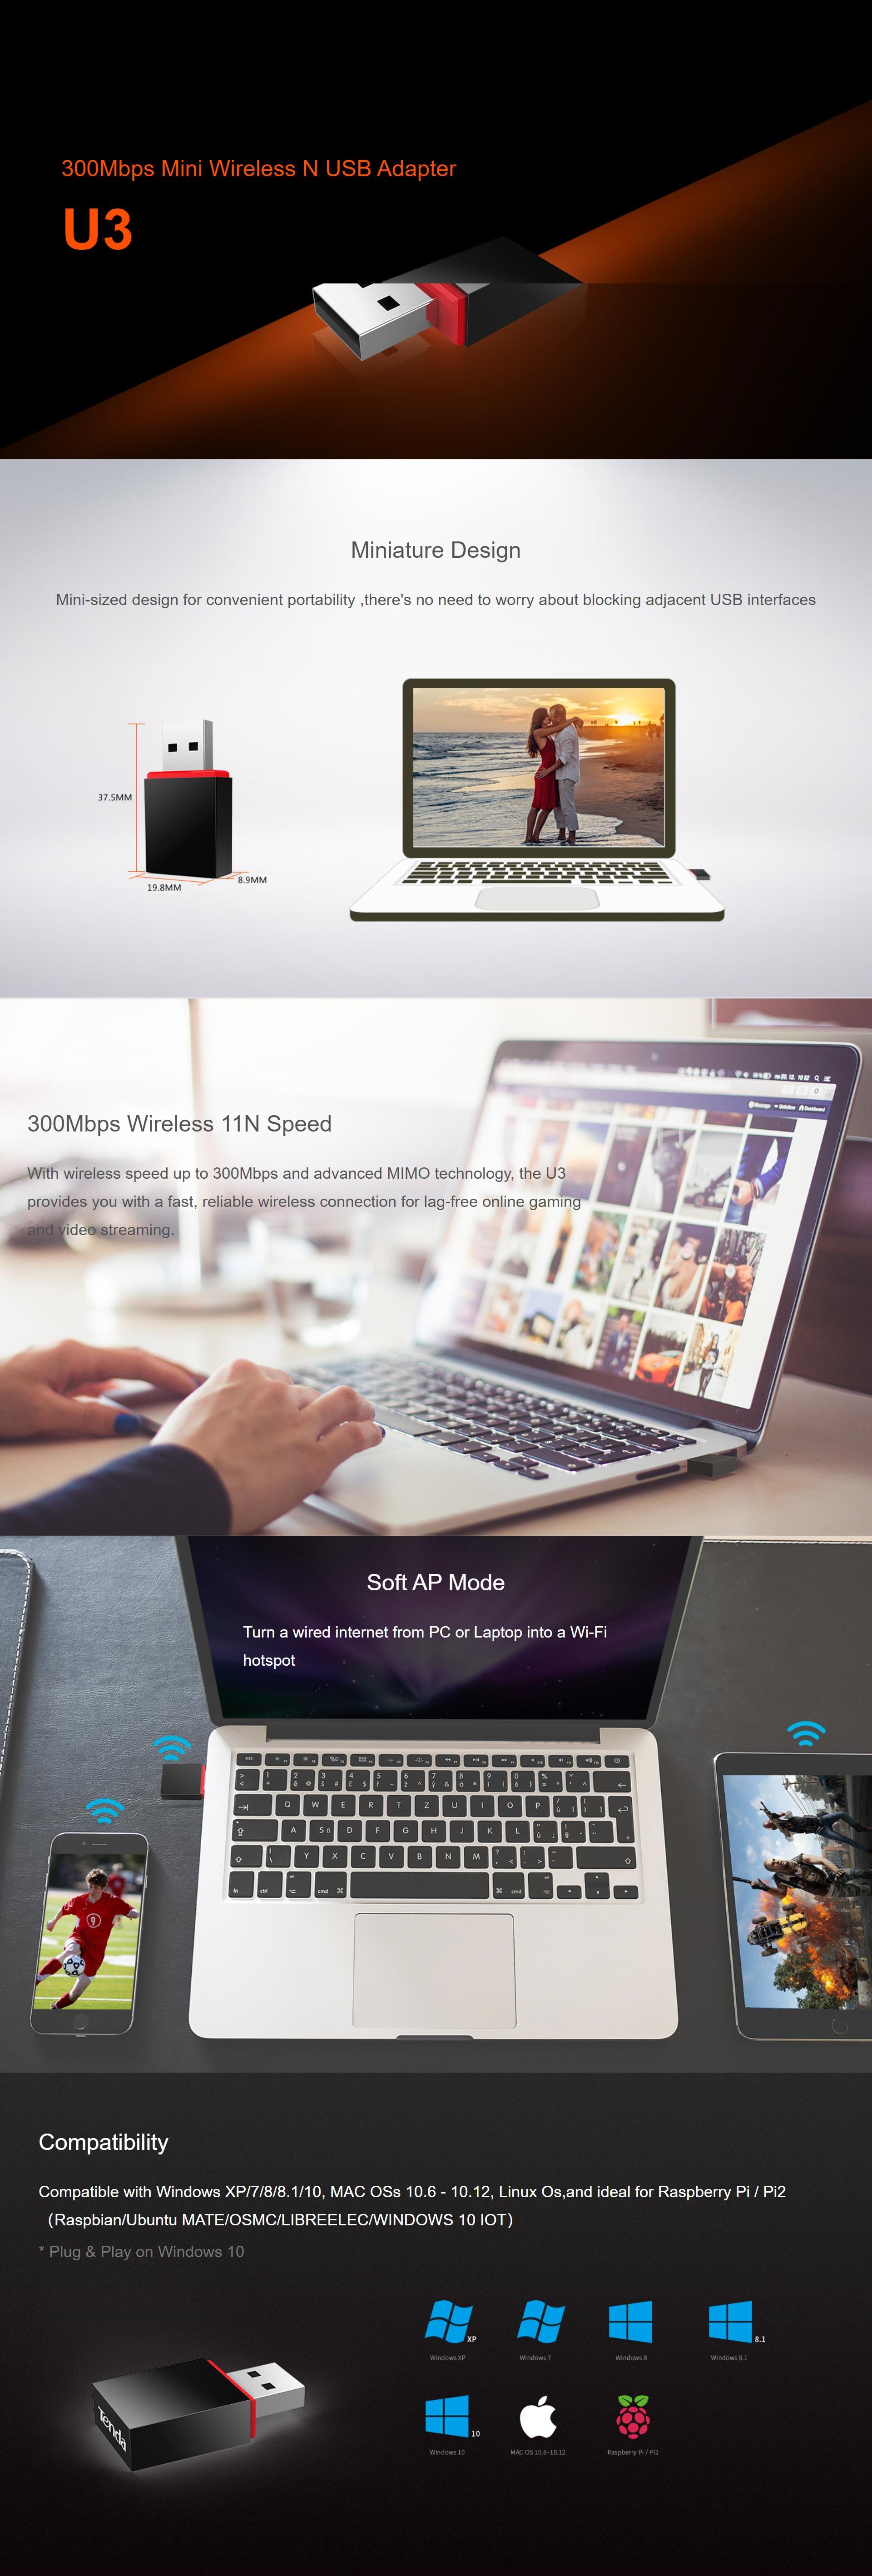 screencapture-tendacn-au-product-U3-html-2021-08-02-09_57_53.jpg